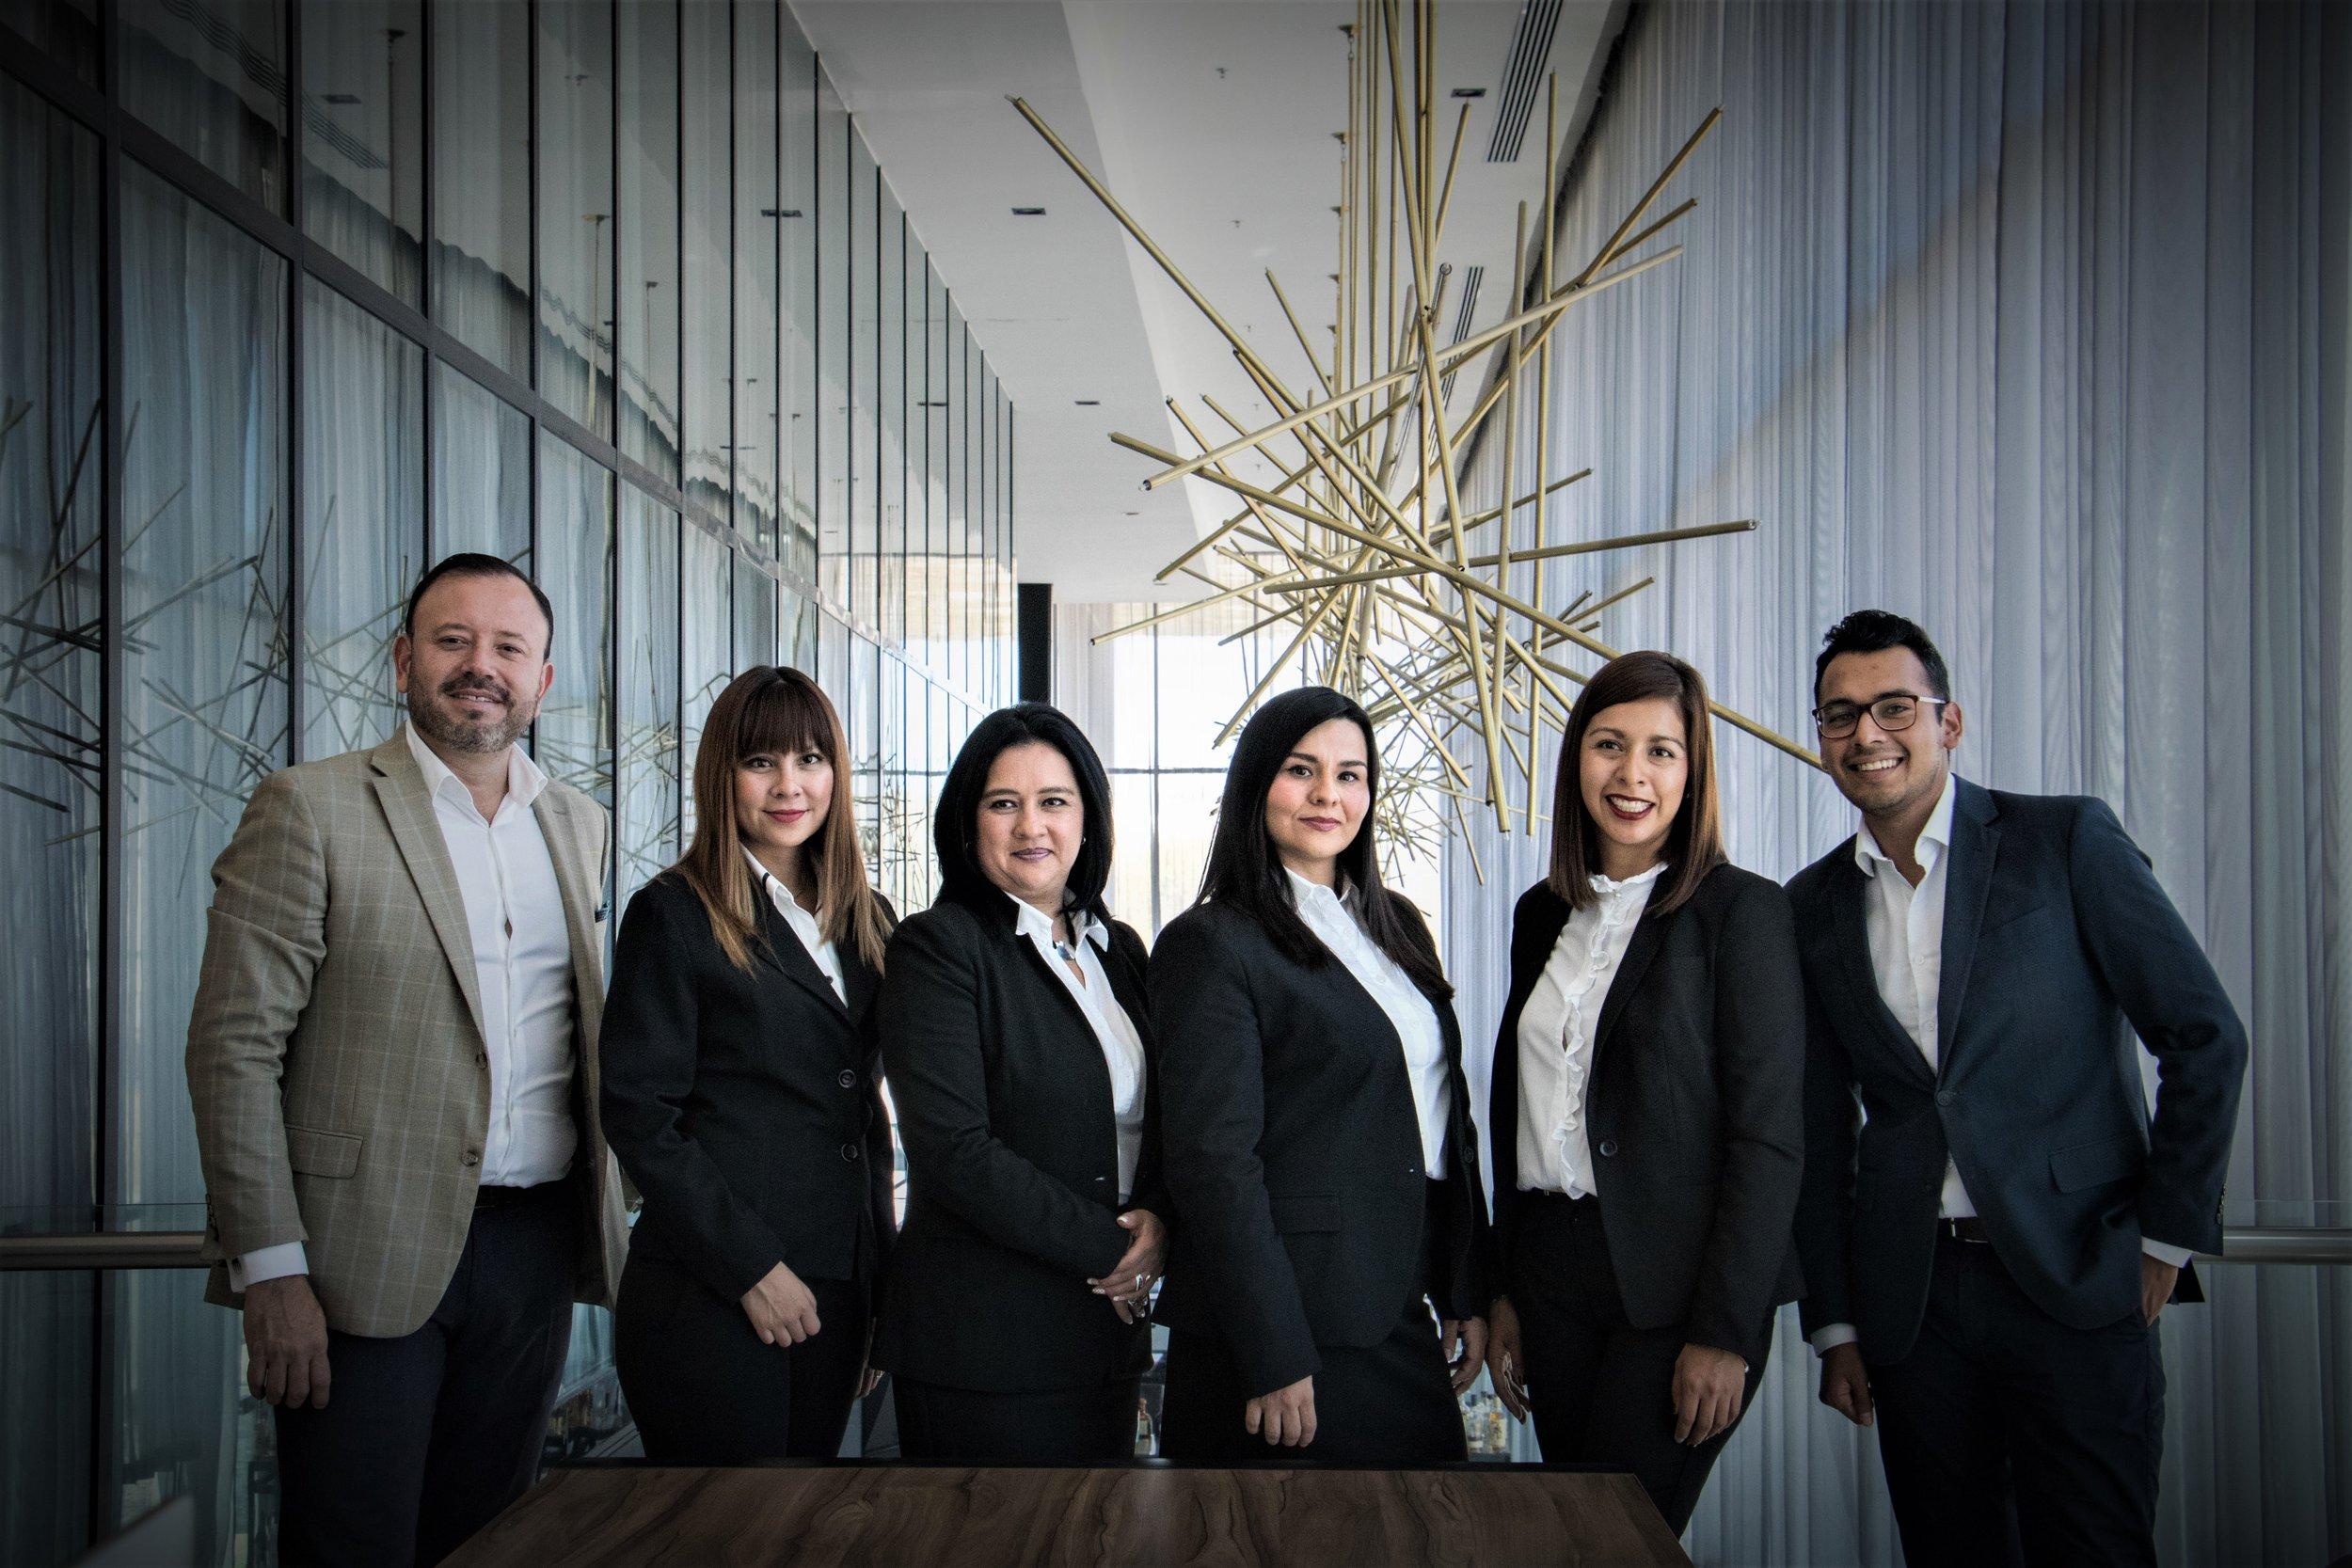 business-confidence-corporate-776615.jpg